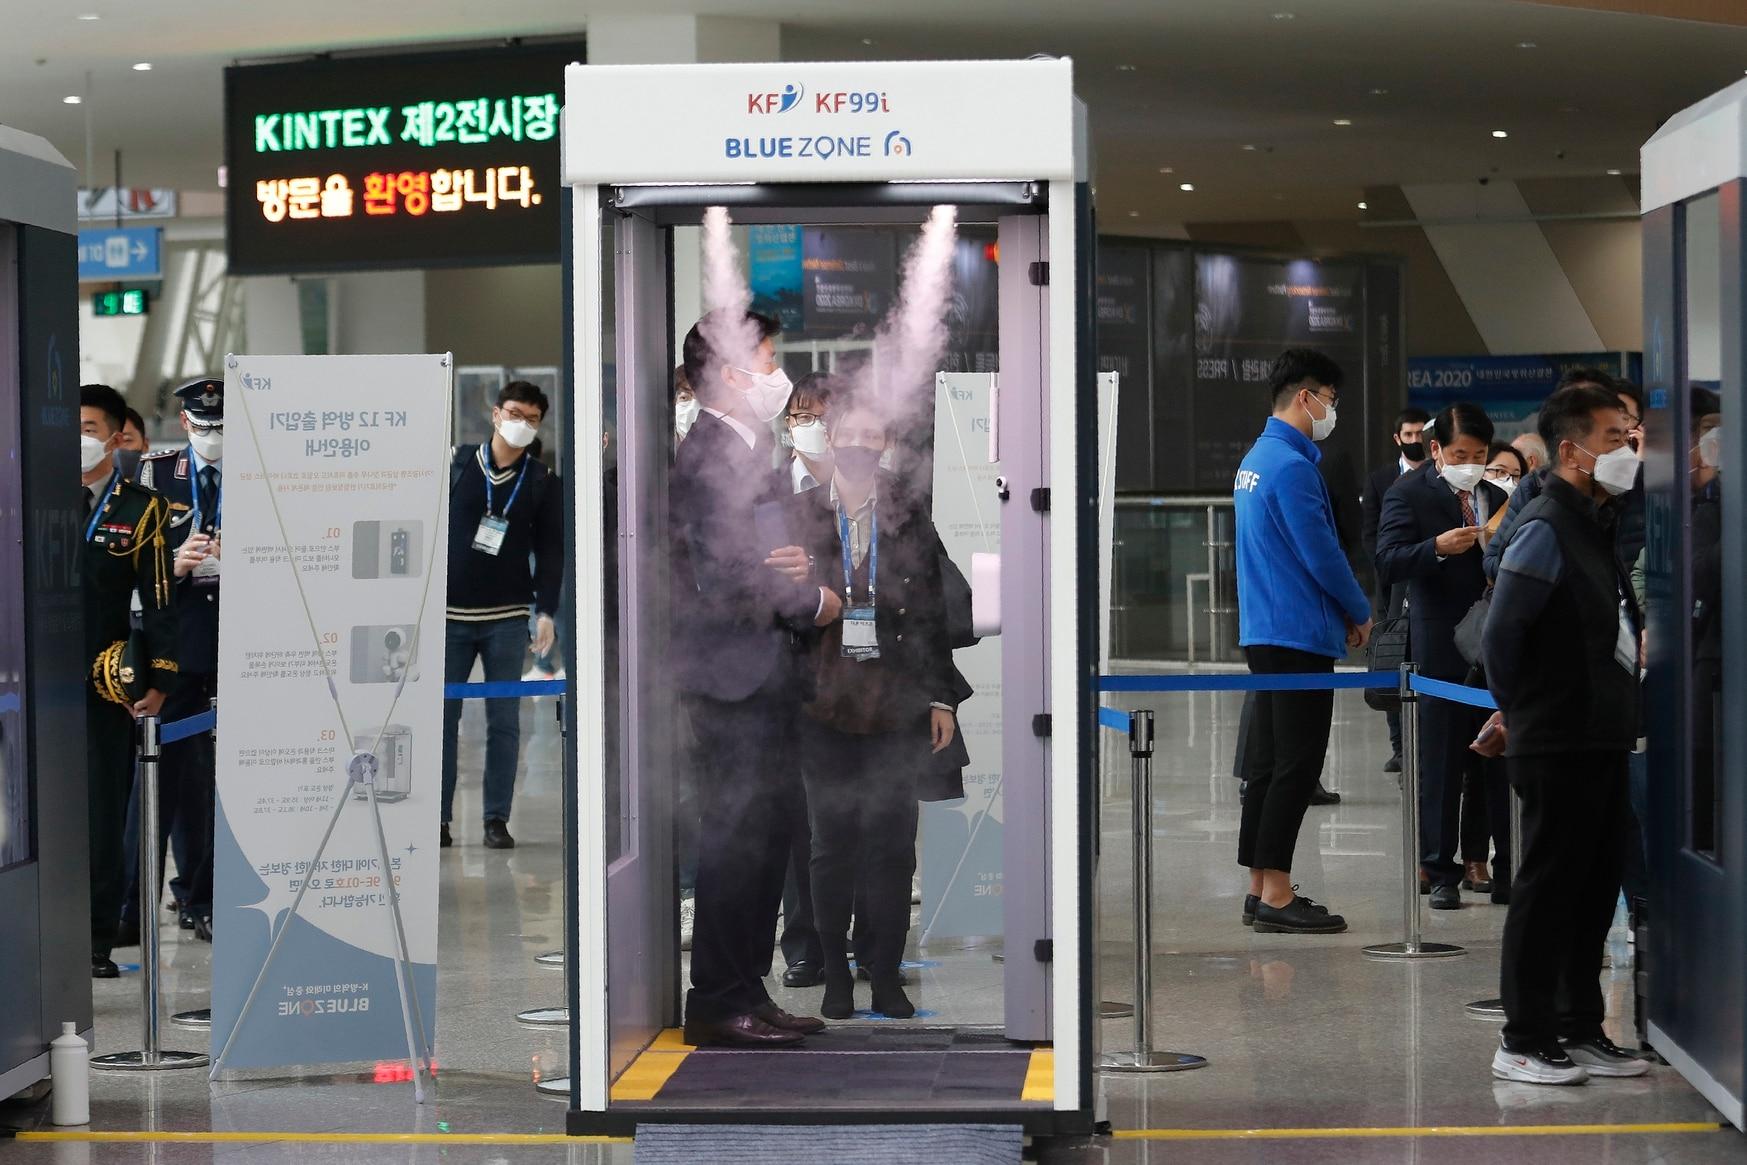 An attendee of DX Korea 2020 stands in a sterilizer as a precaution against the novel coronavirus on Nov. 18, 2020. (Ahn Young-joon/AP)